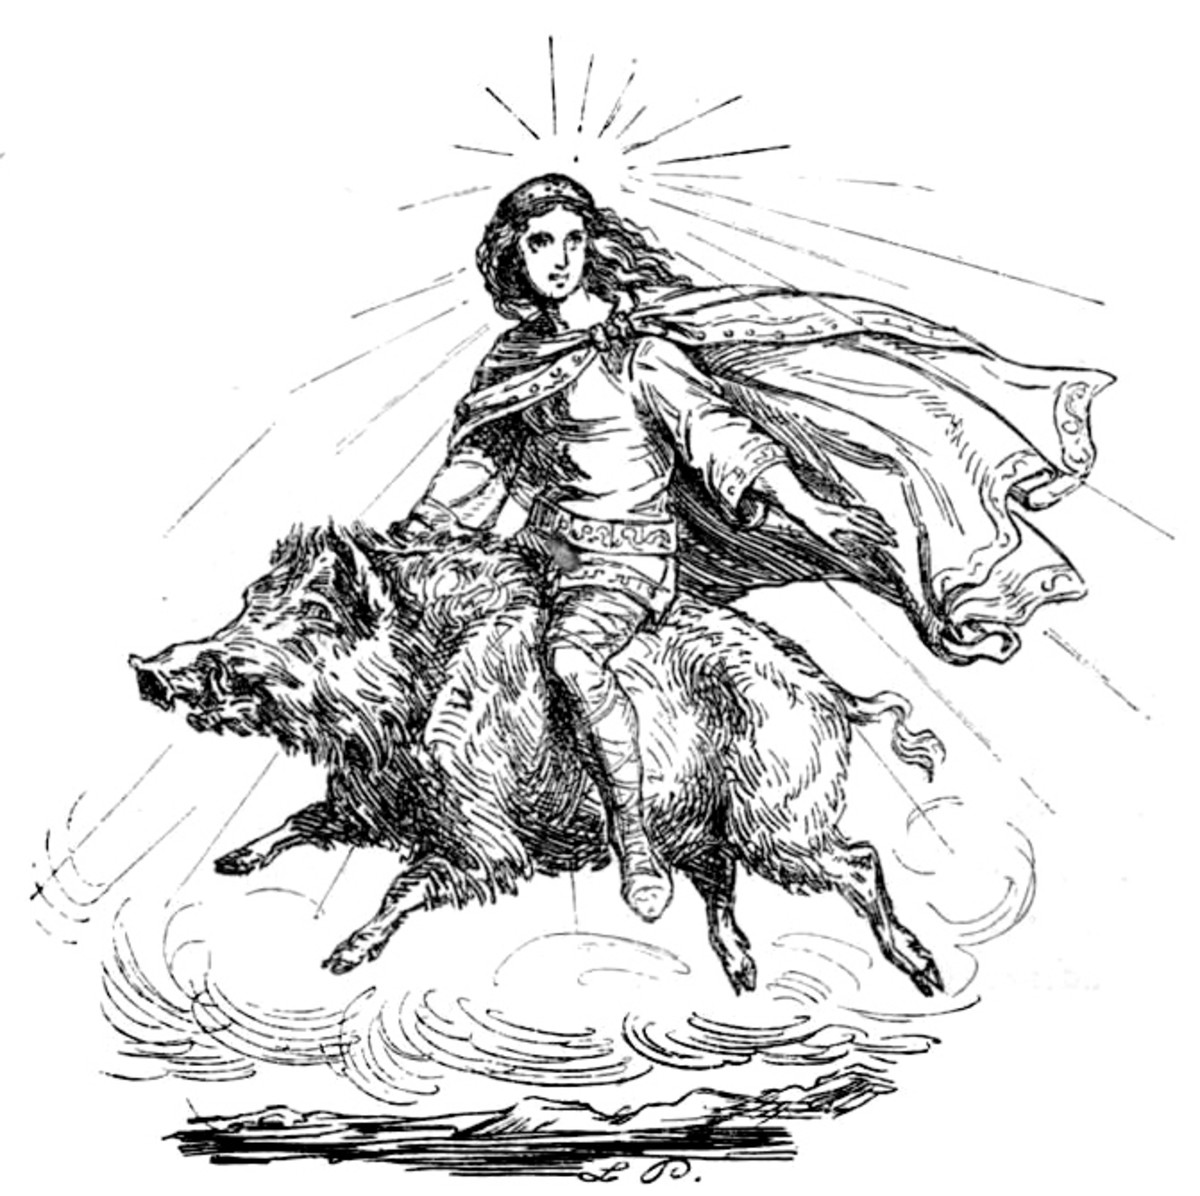 Freyja riding her boar - 1863